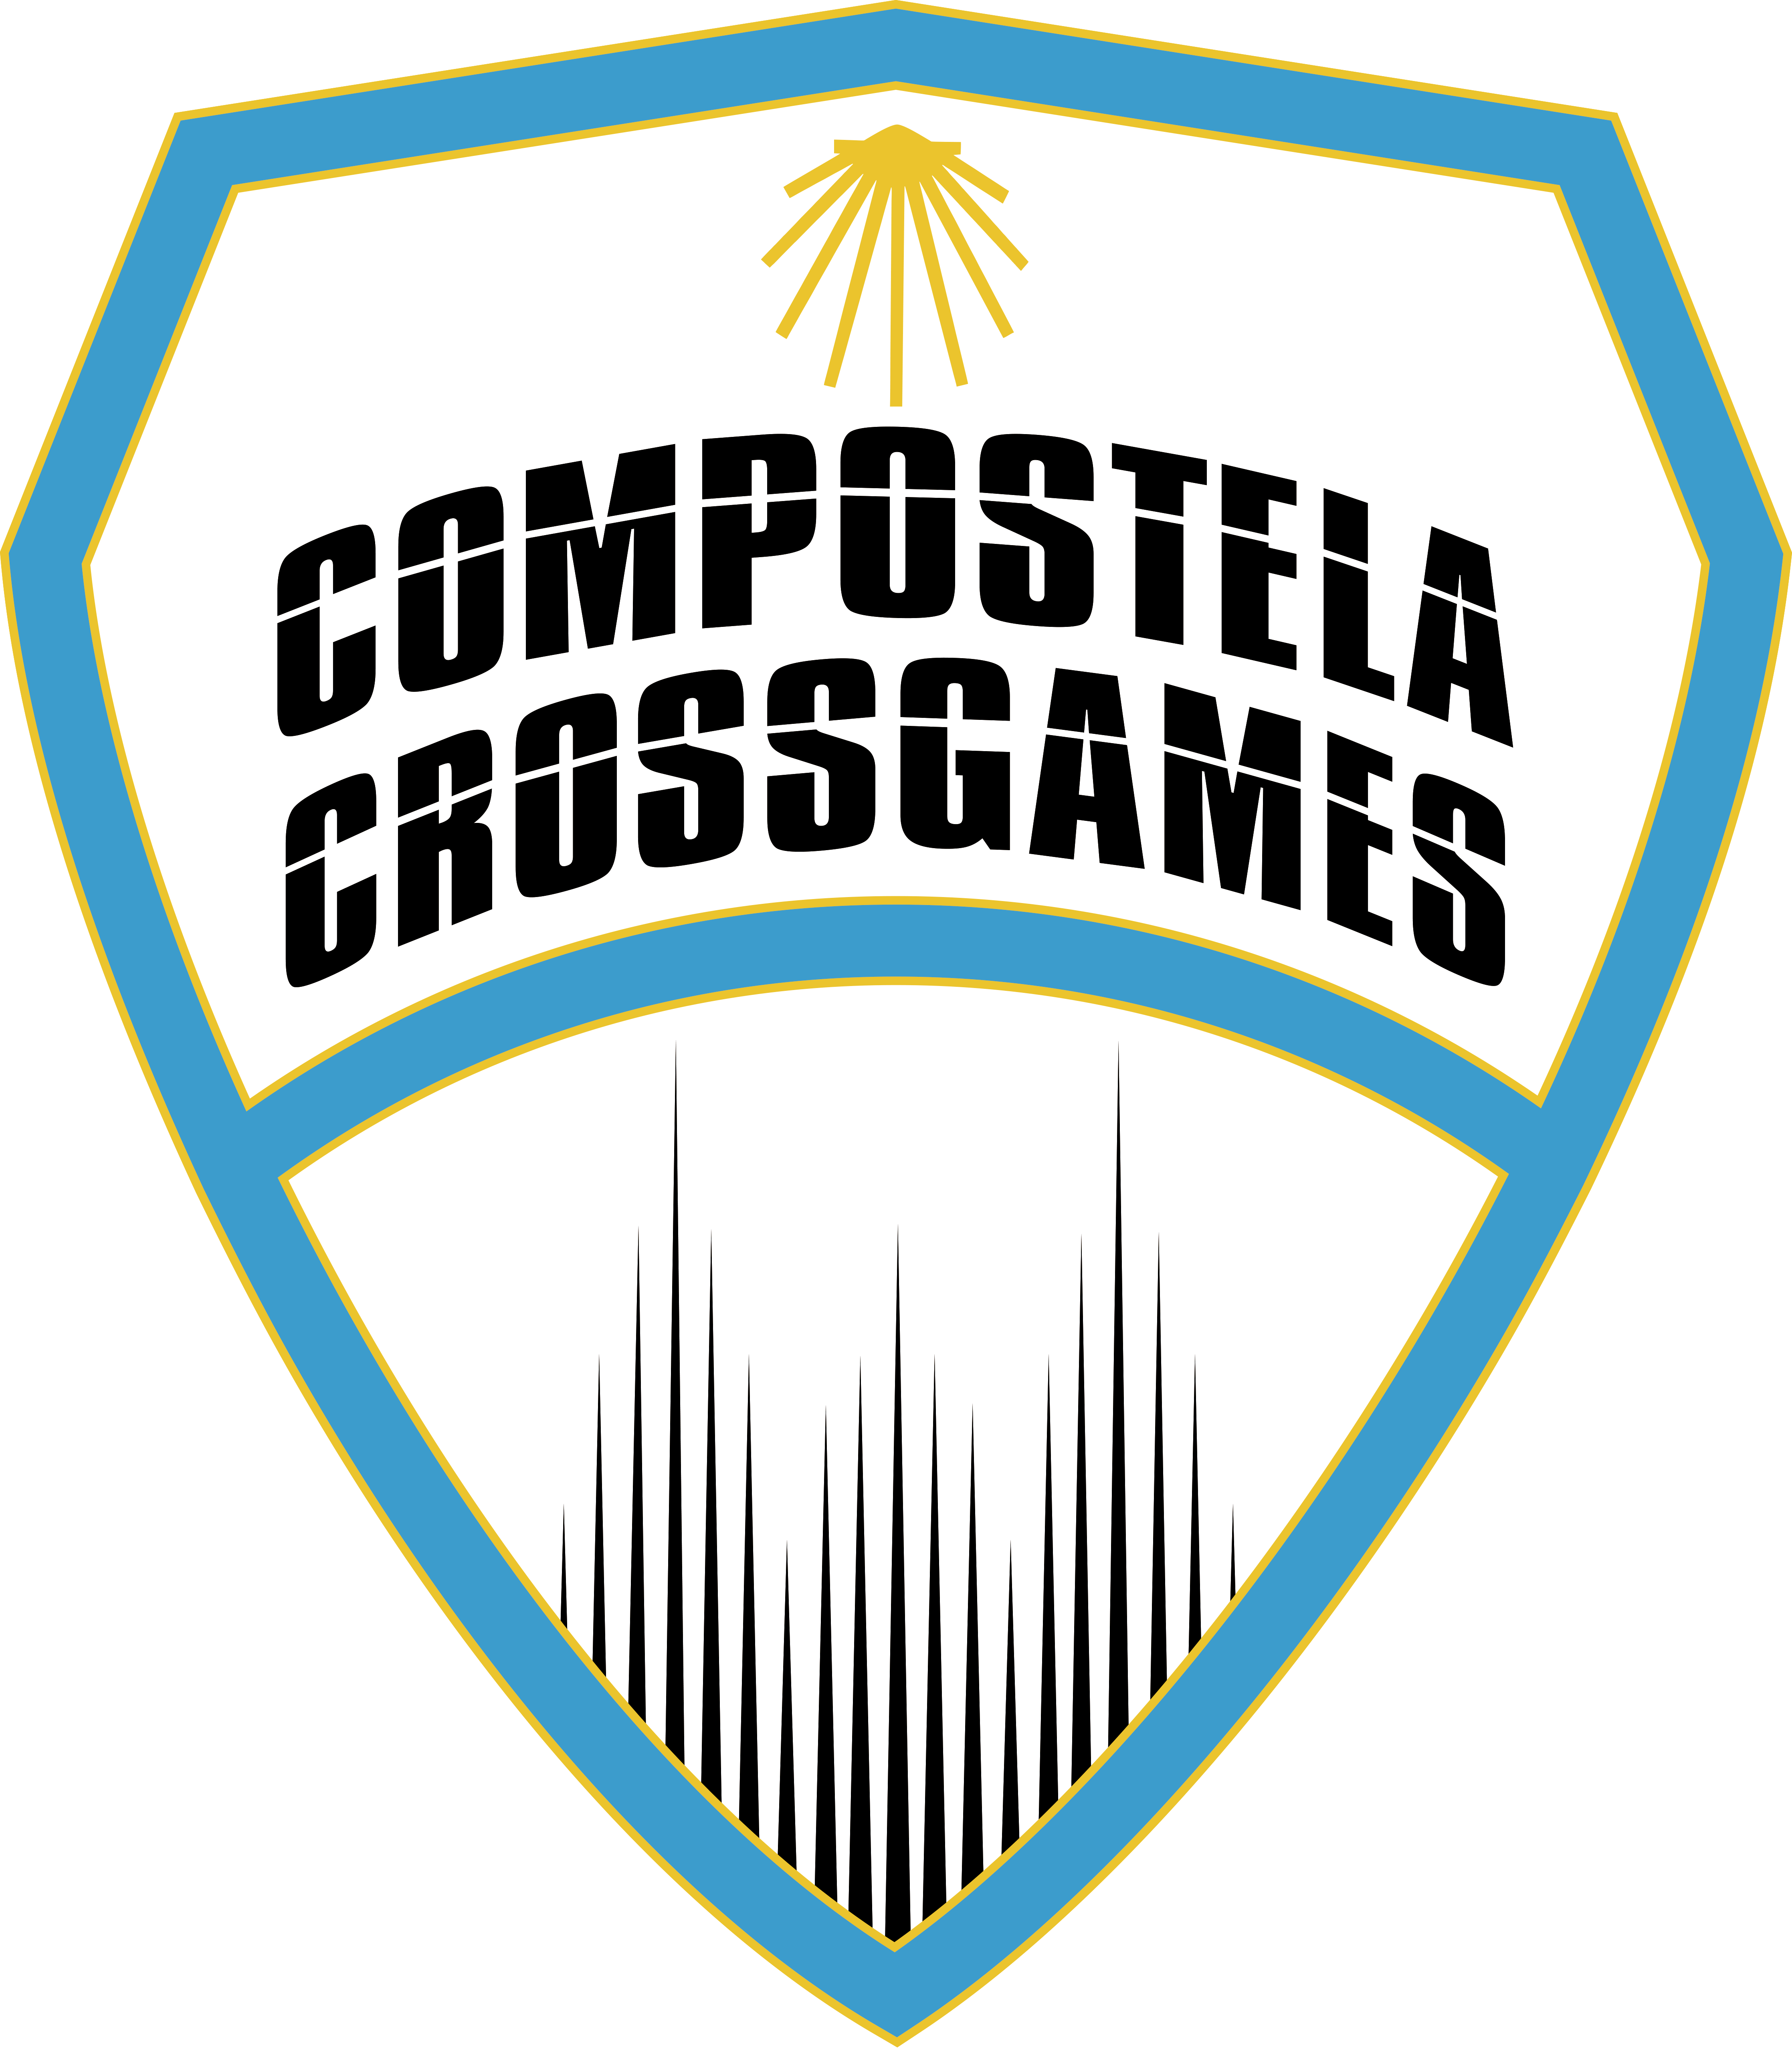 Compostela Crossgames